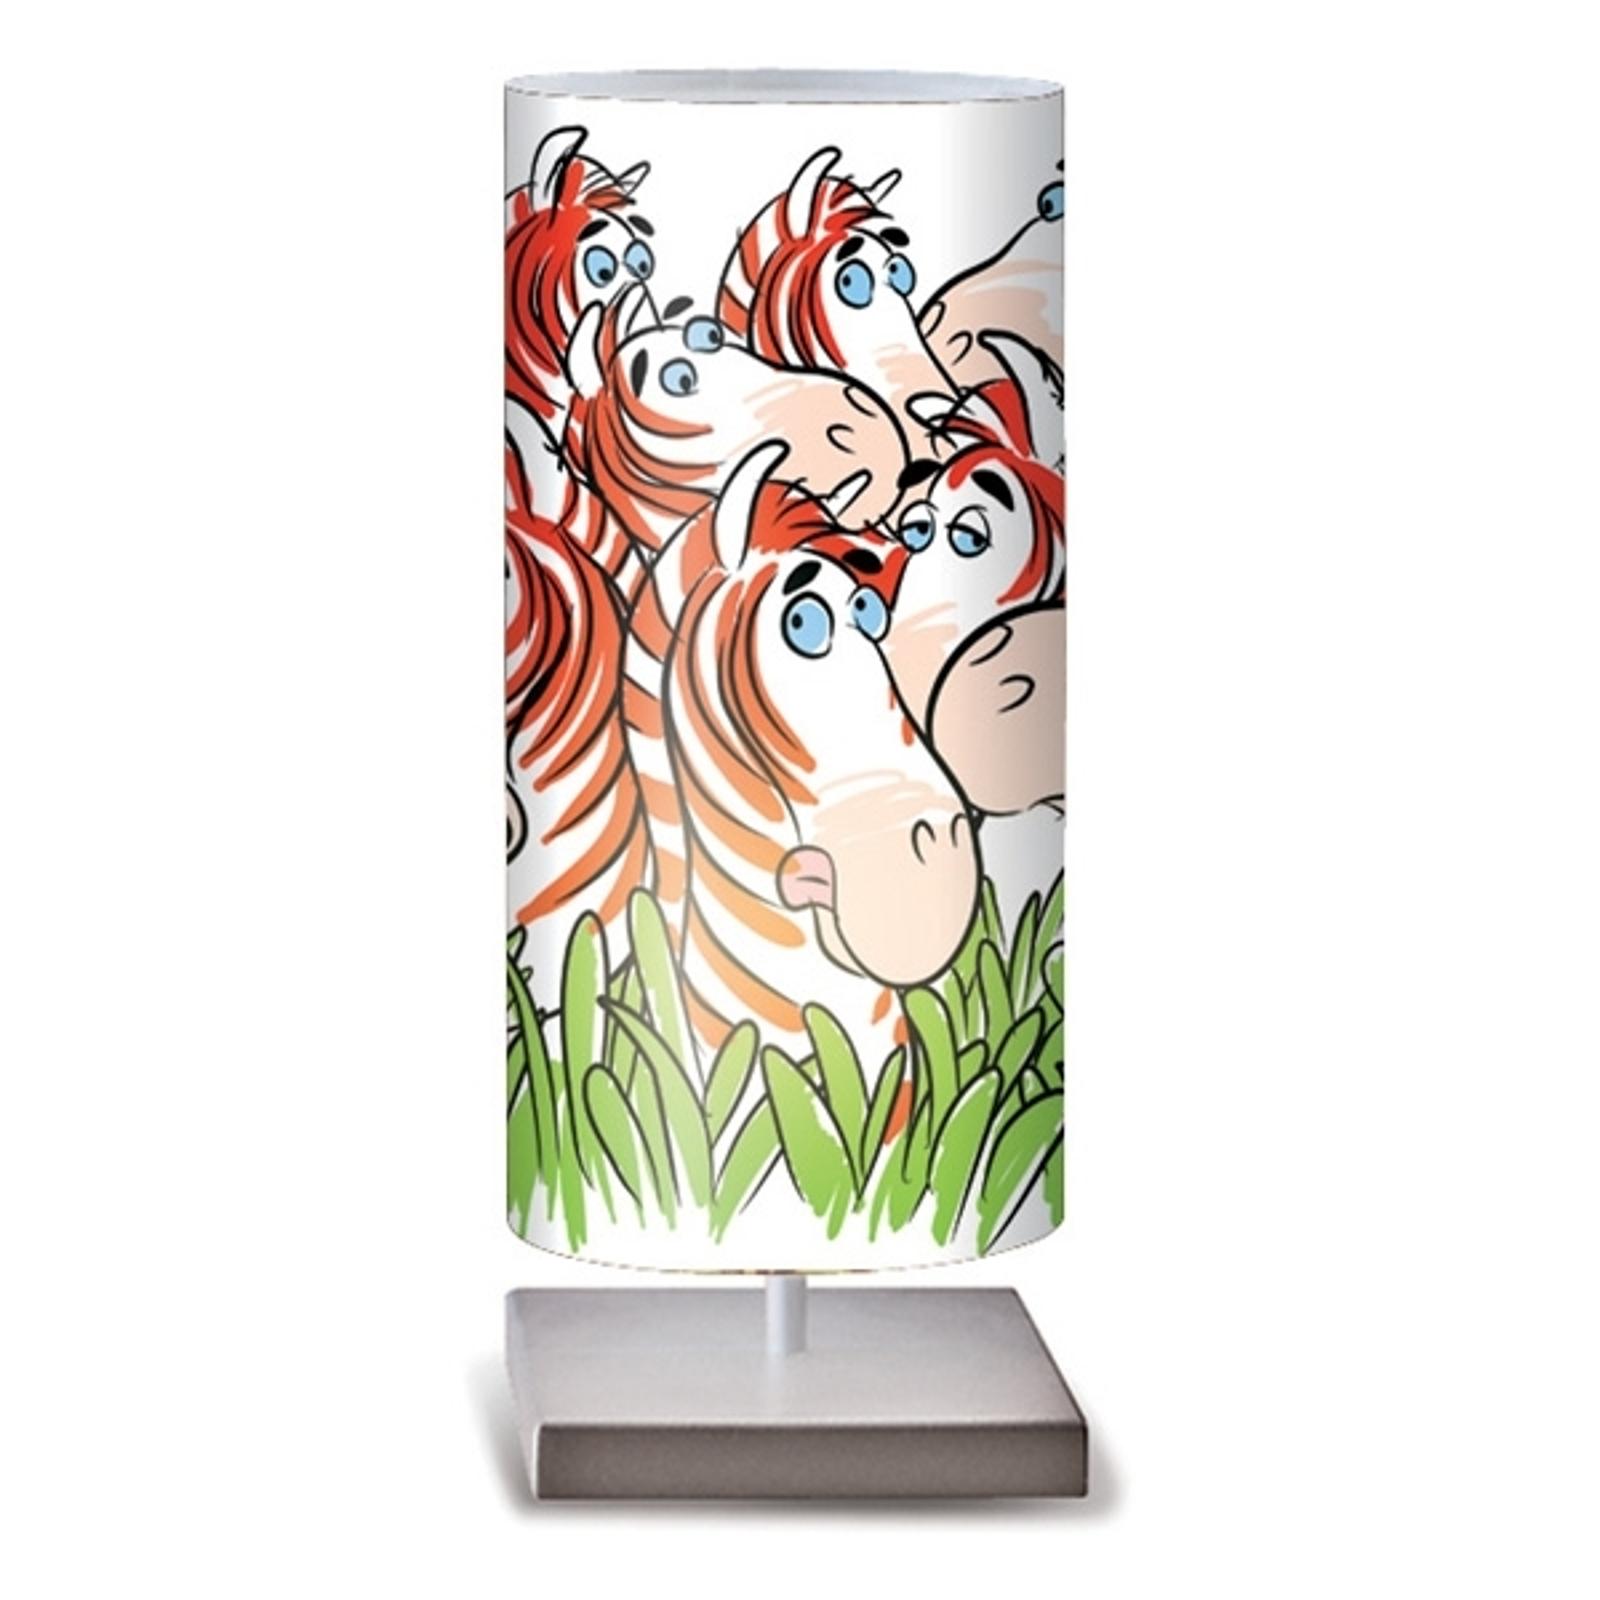 Zebre - fargeglad bordlamep for barnerommet